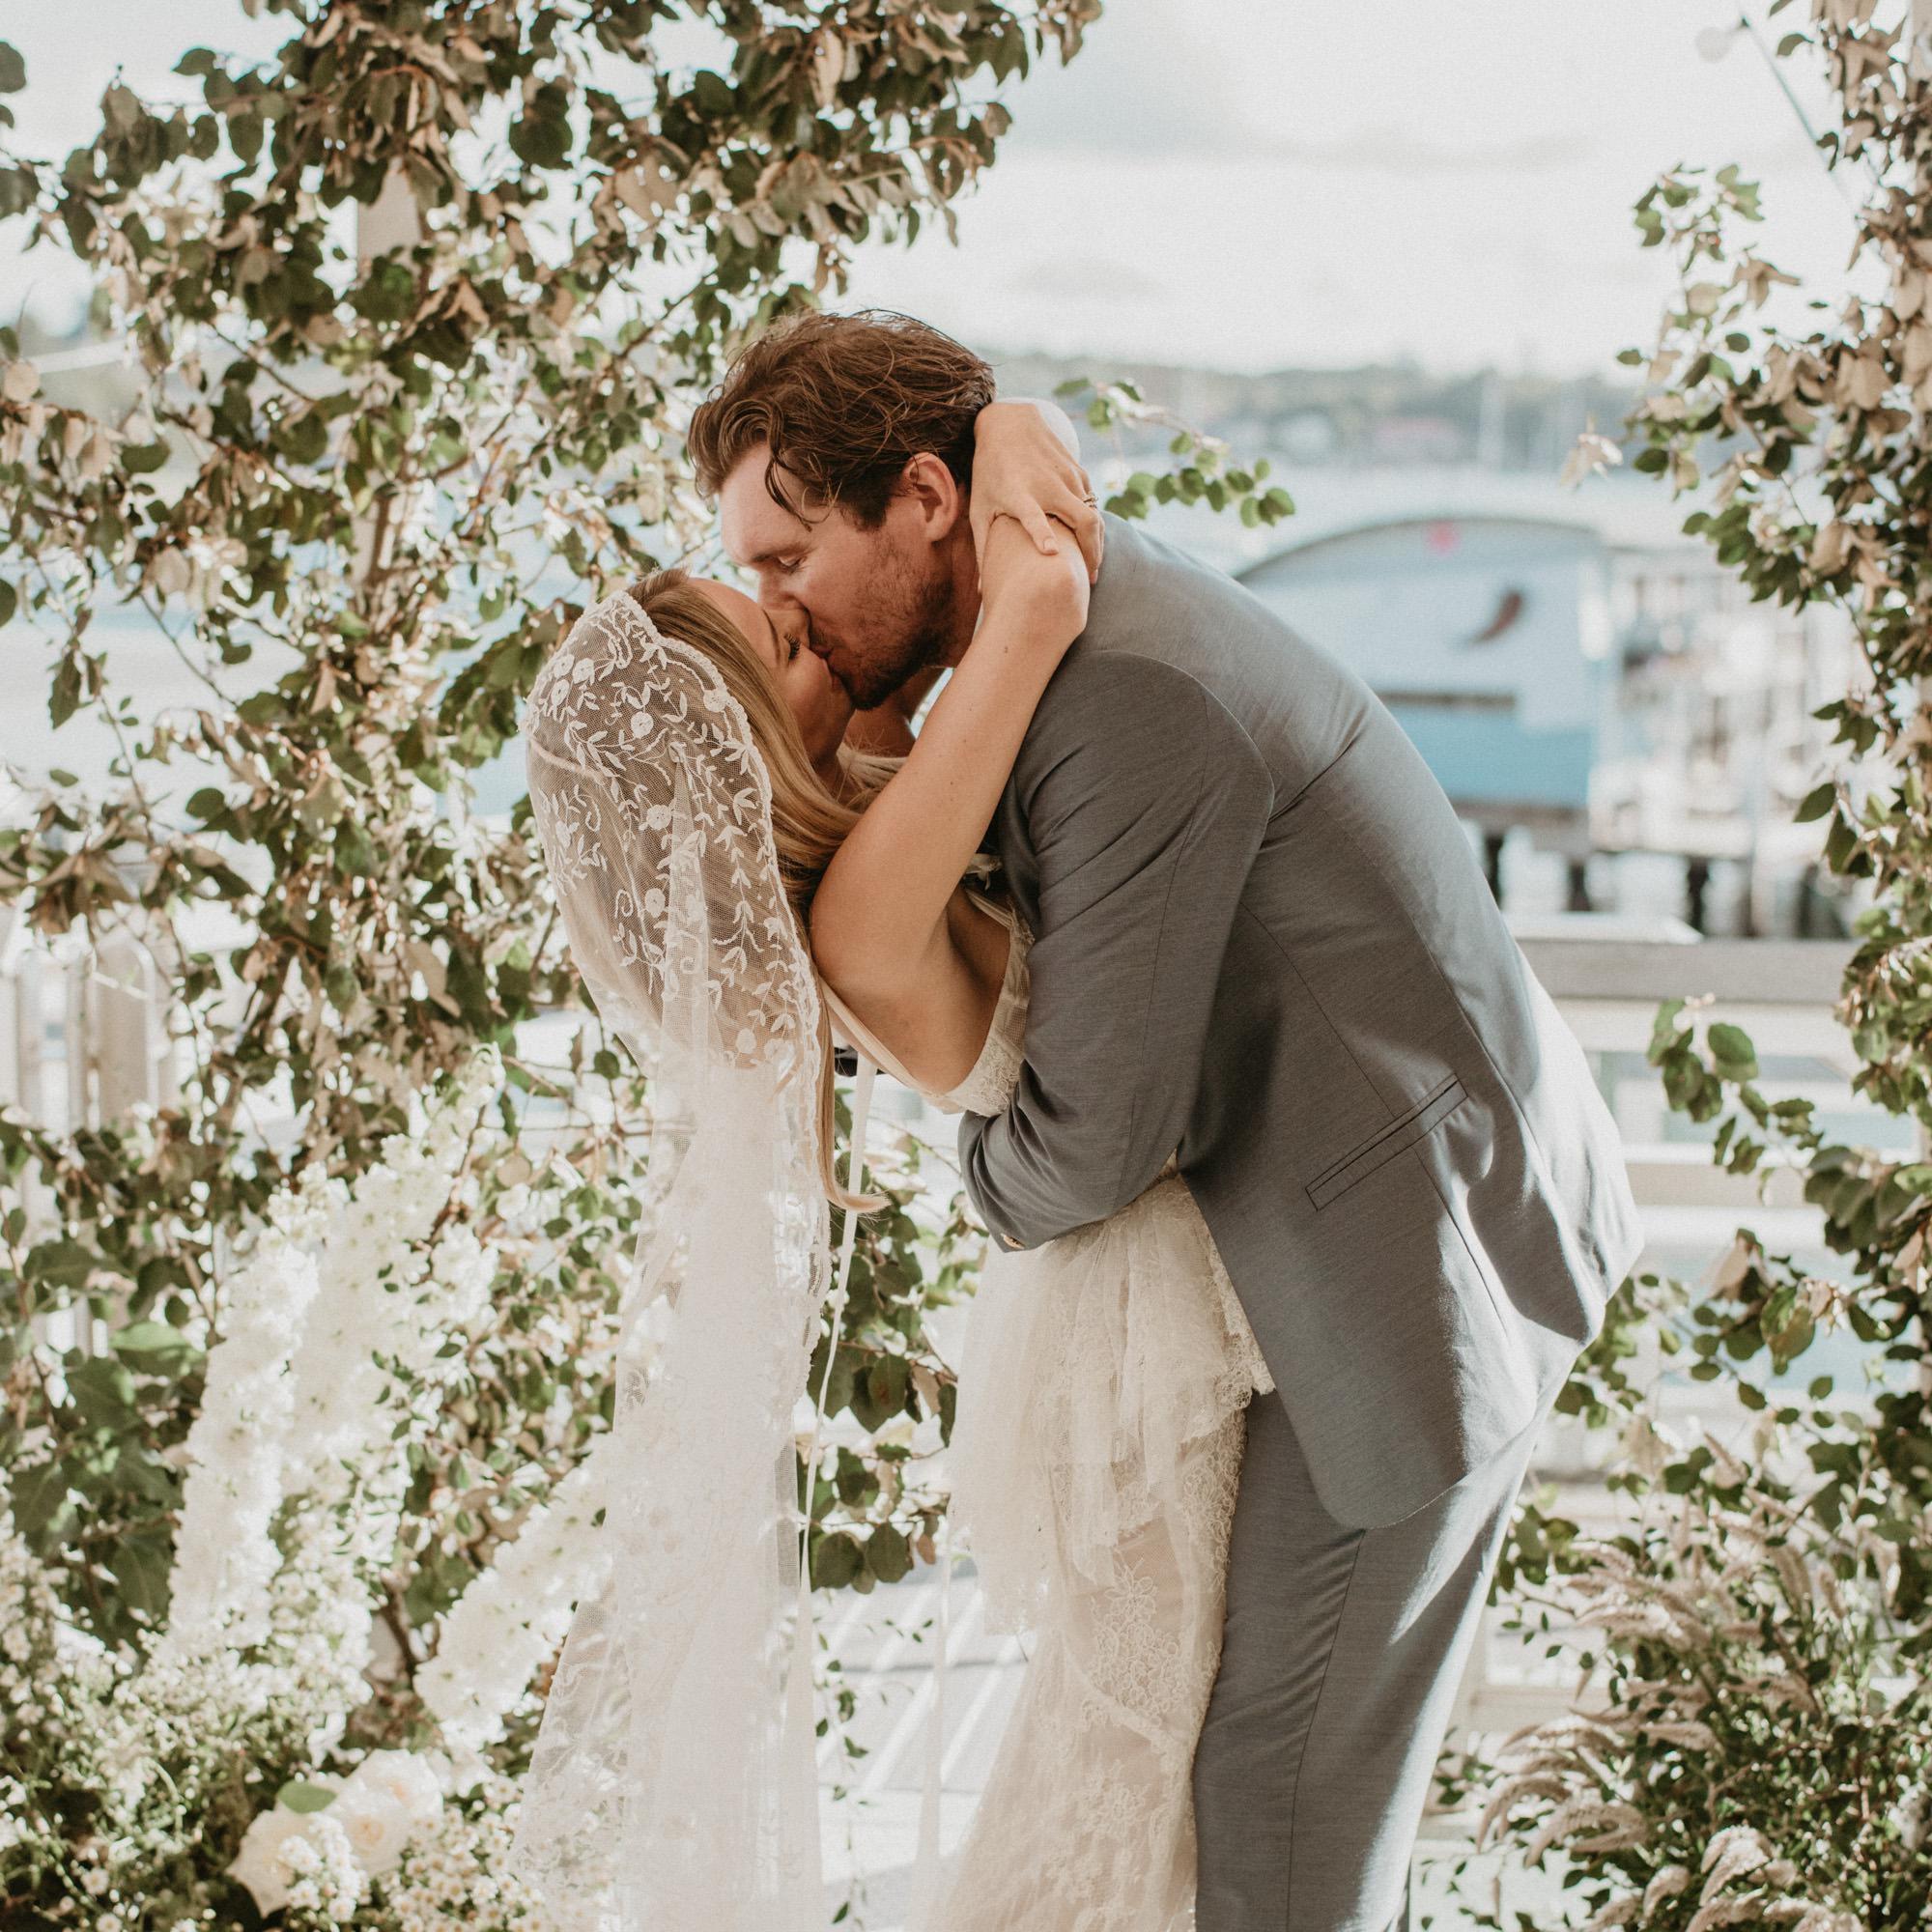 Stone Cold Fox Designer Cydney Morris S Vintage Inspired Wedding